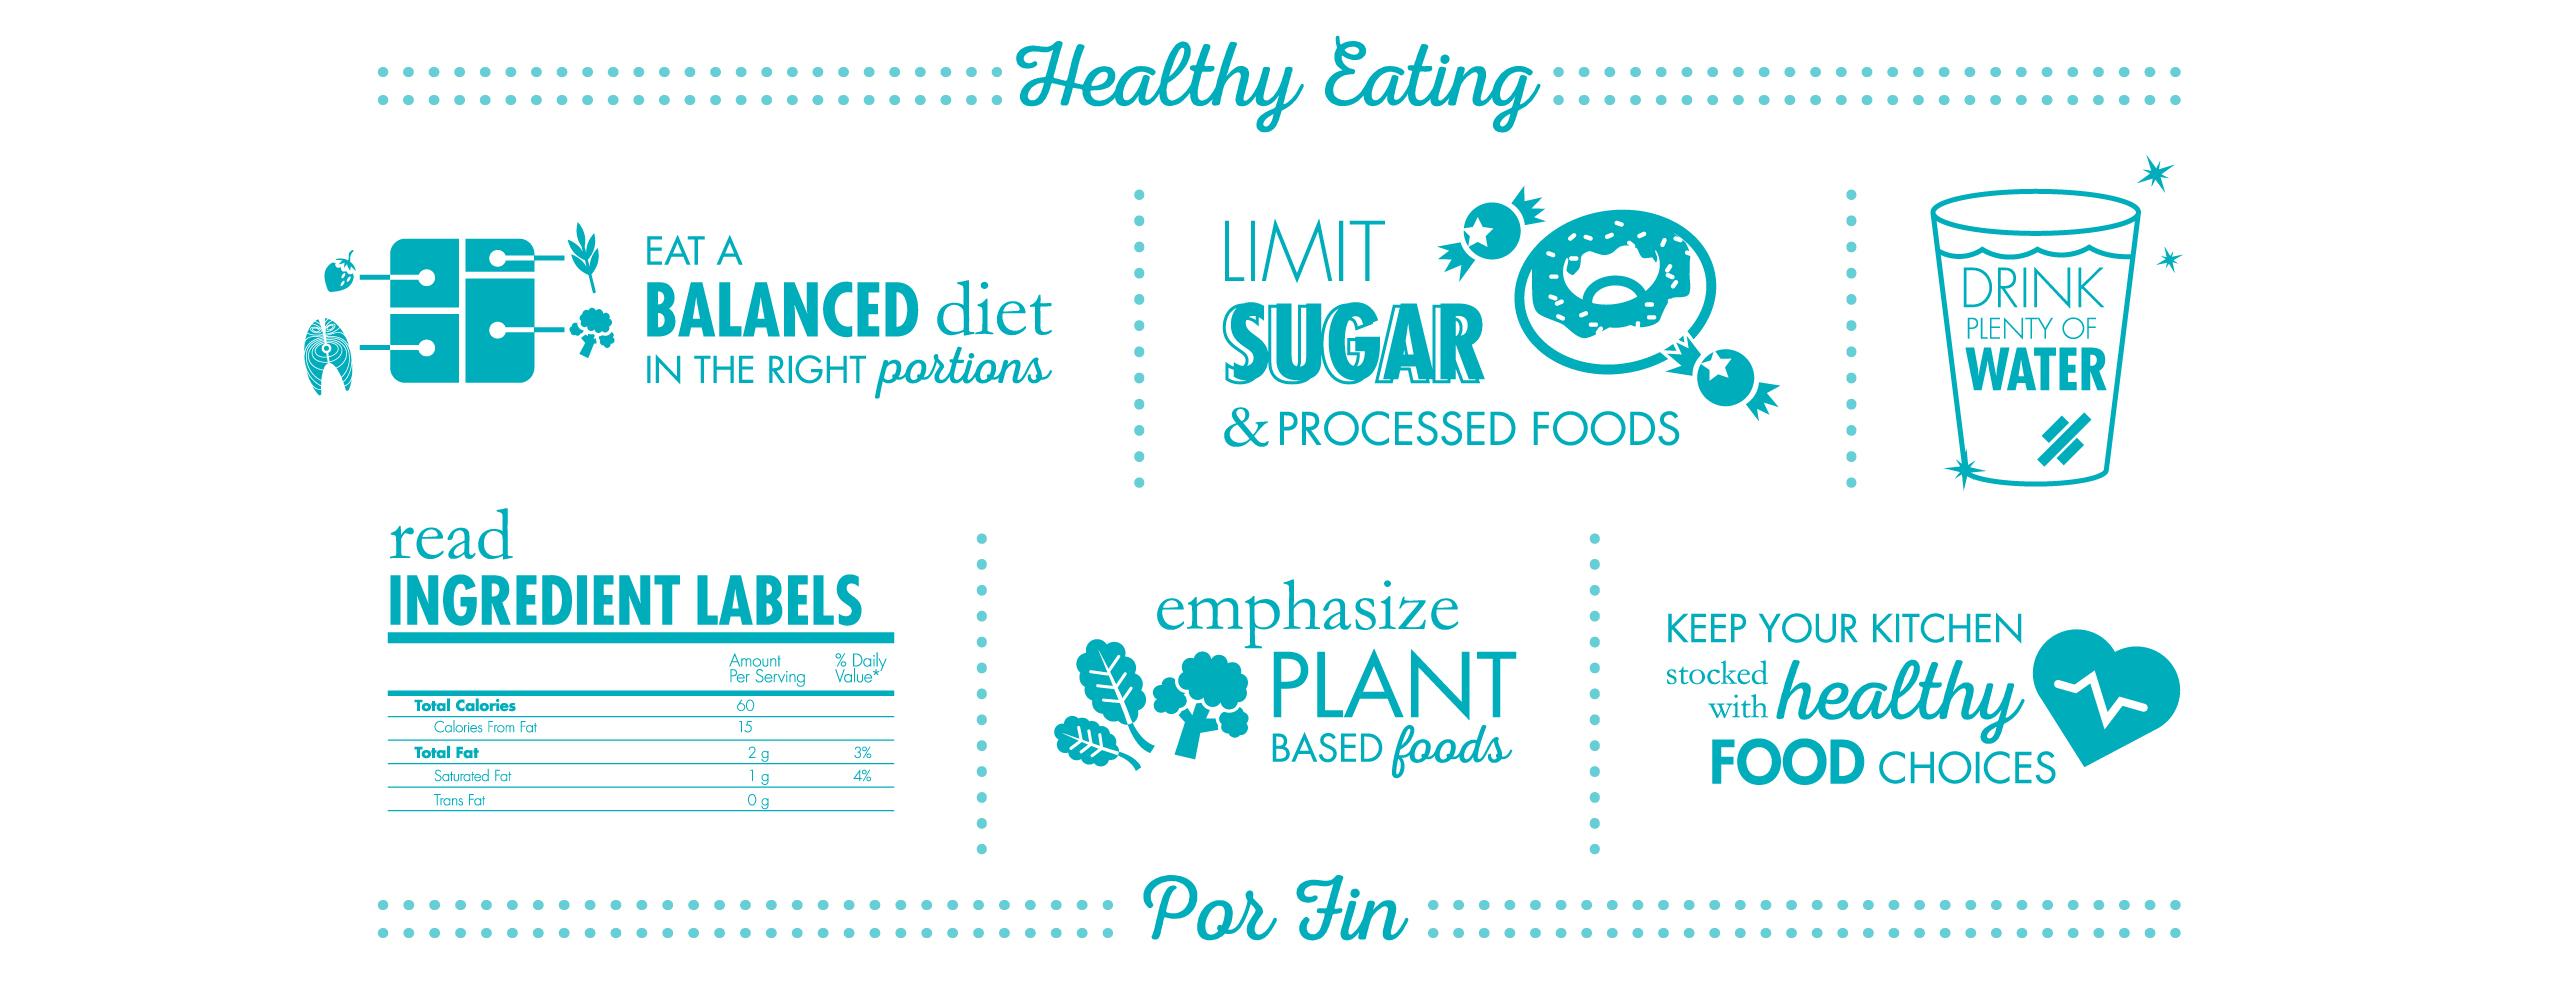 Здравослвоно хранене